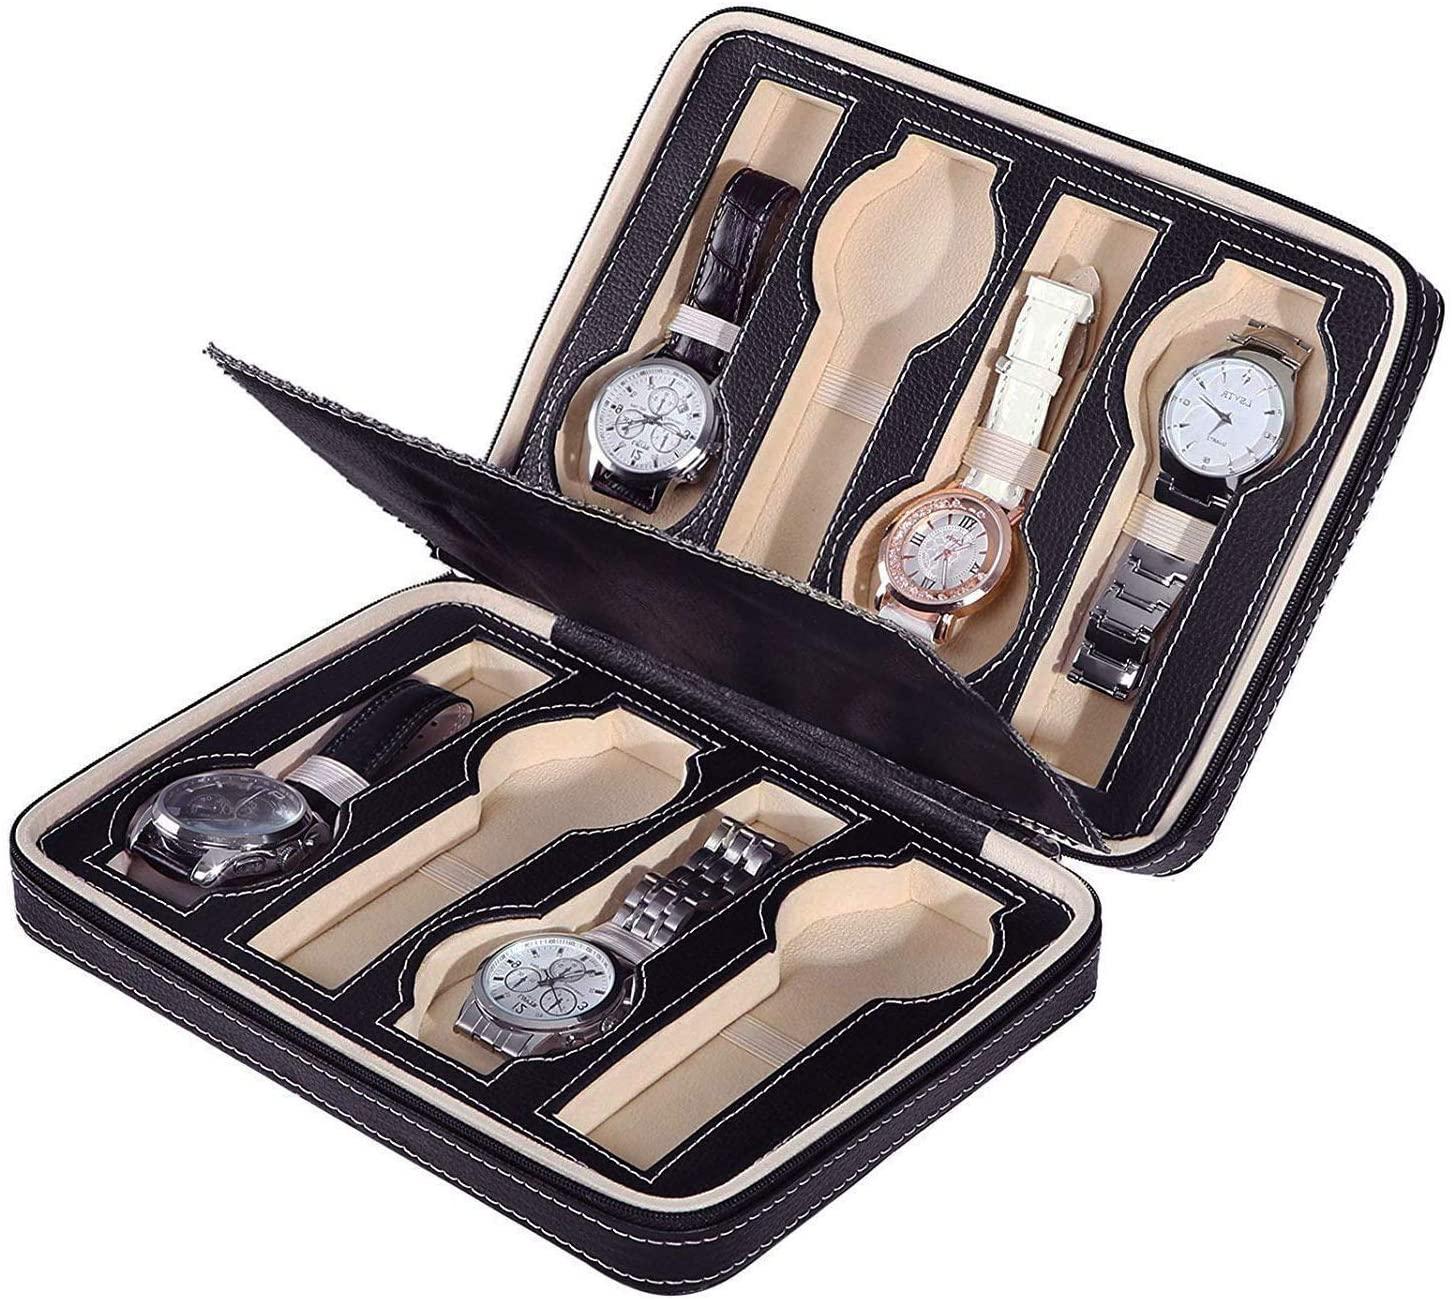 Binlin Mini Watch Box,8-Slot Portable Watch Box Travel Case Storage Organizer,Black